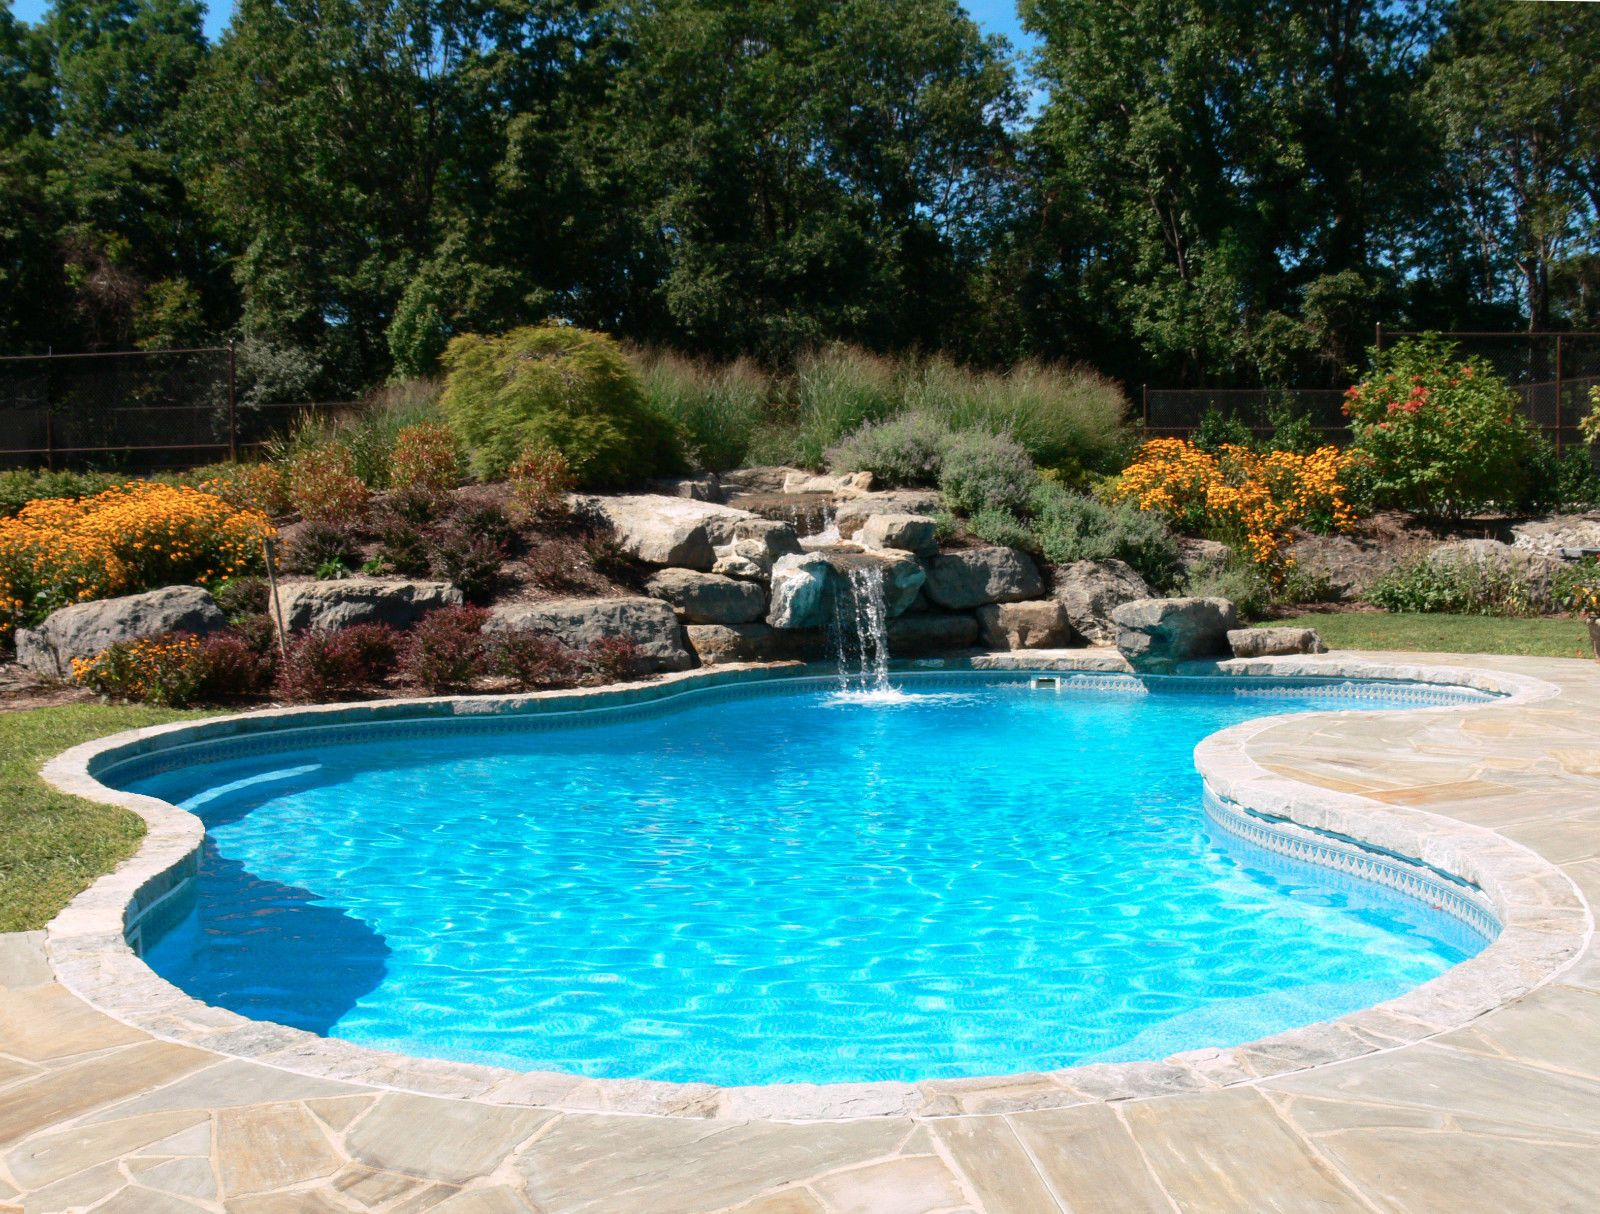 20 u0027 x 40 u0027 mountain loch steel wall inground swimming pool kit